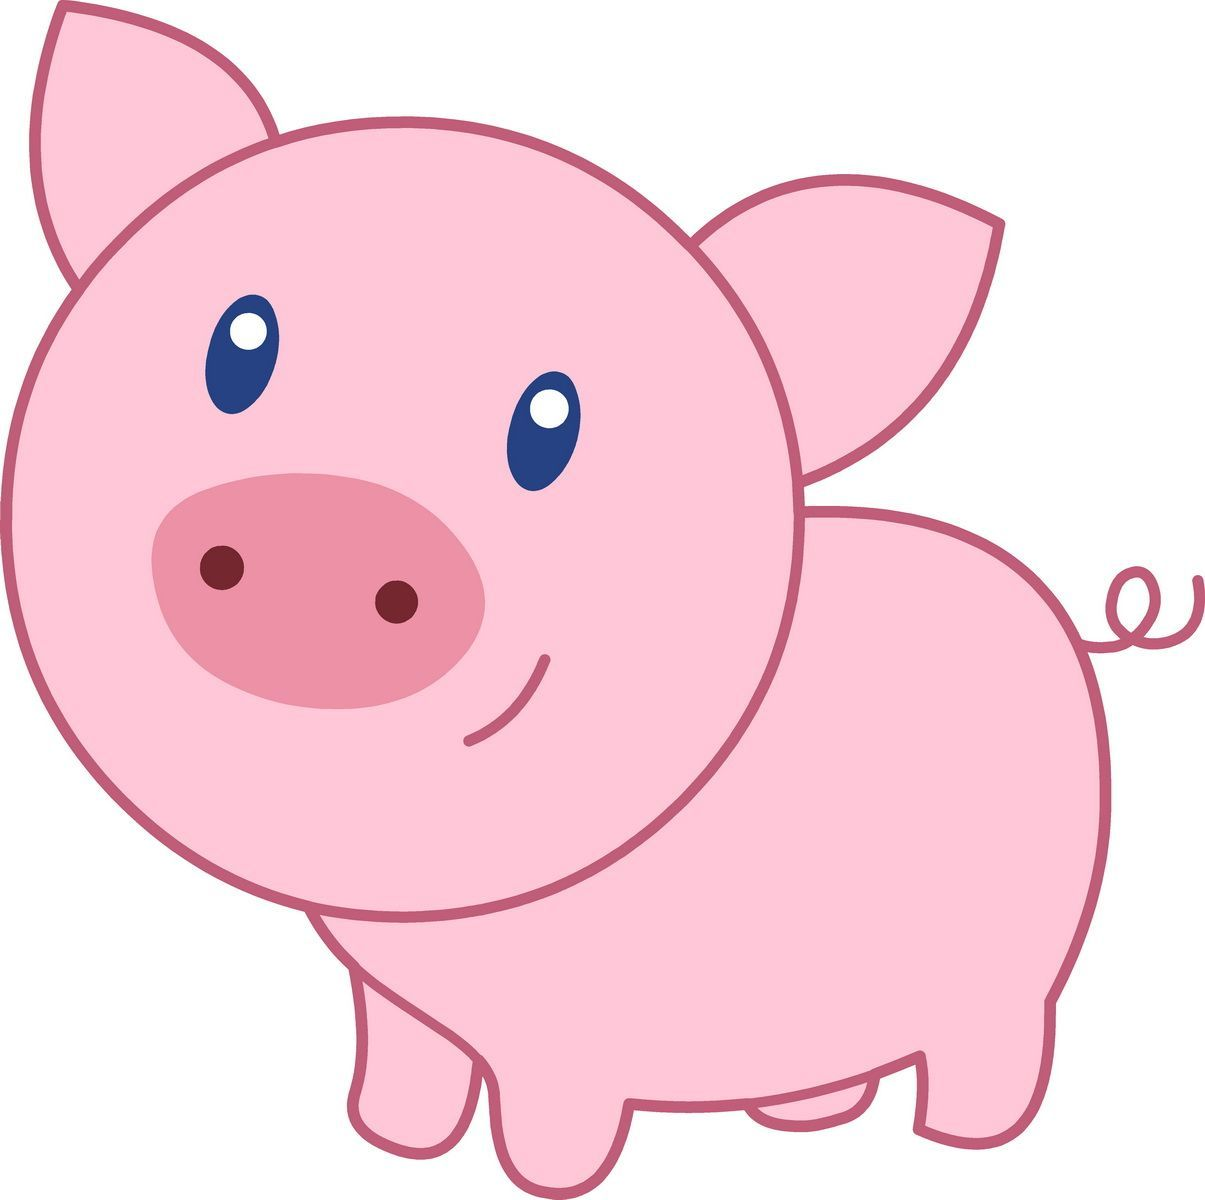 cute cartoon pigs wallpaper version - photo #7